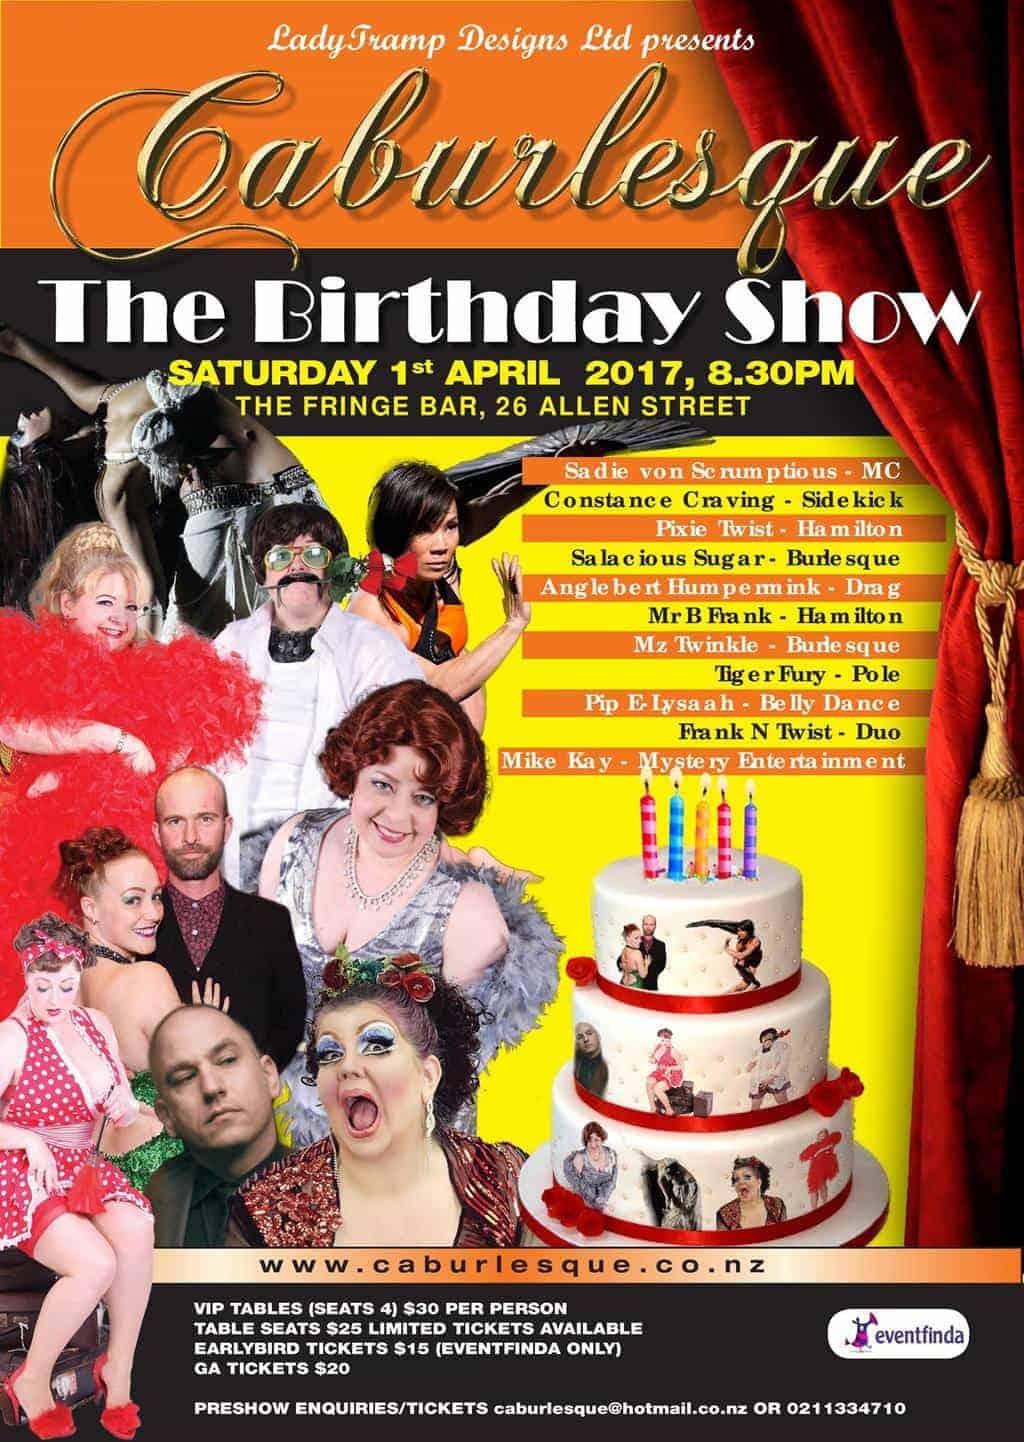 Caburlesque: The Birthday Show